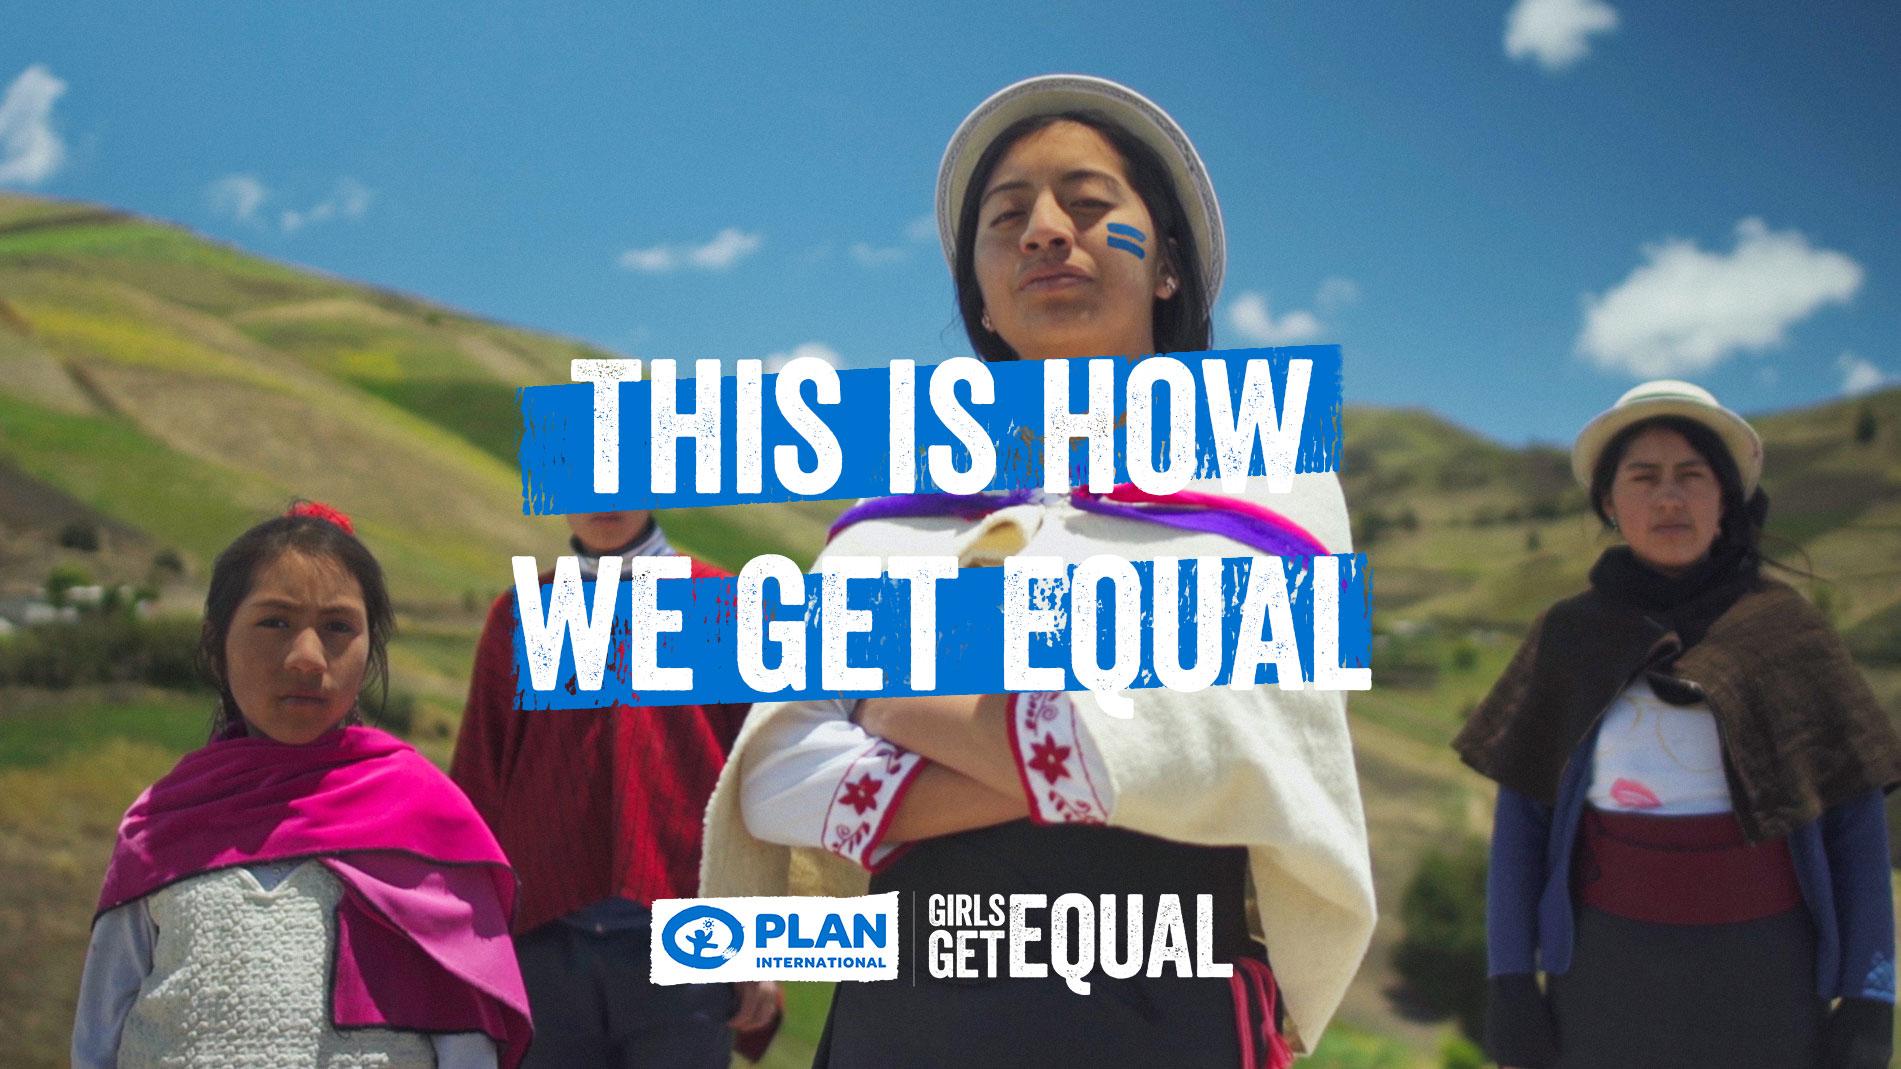 Girls Get Equal